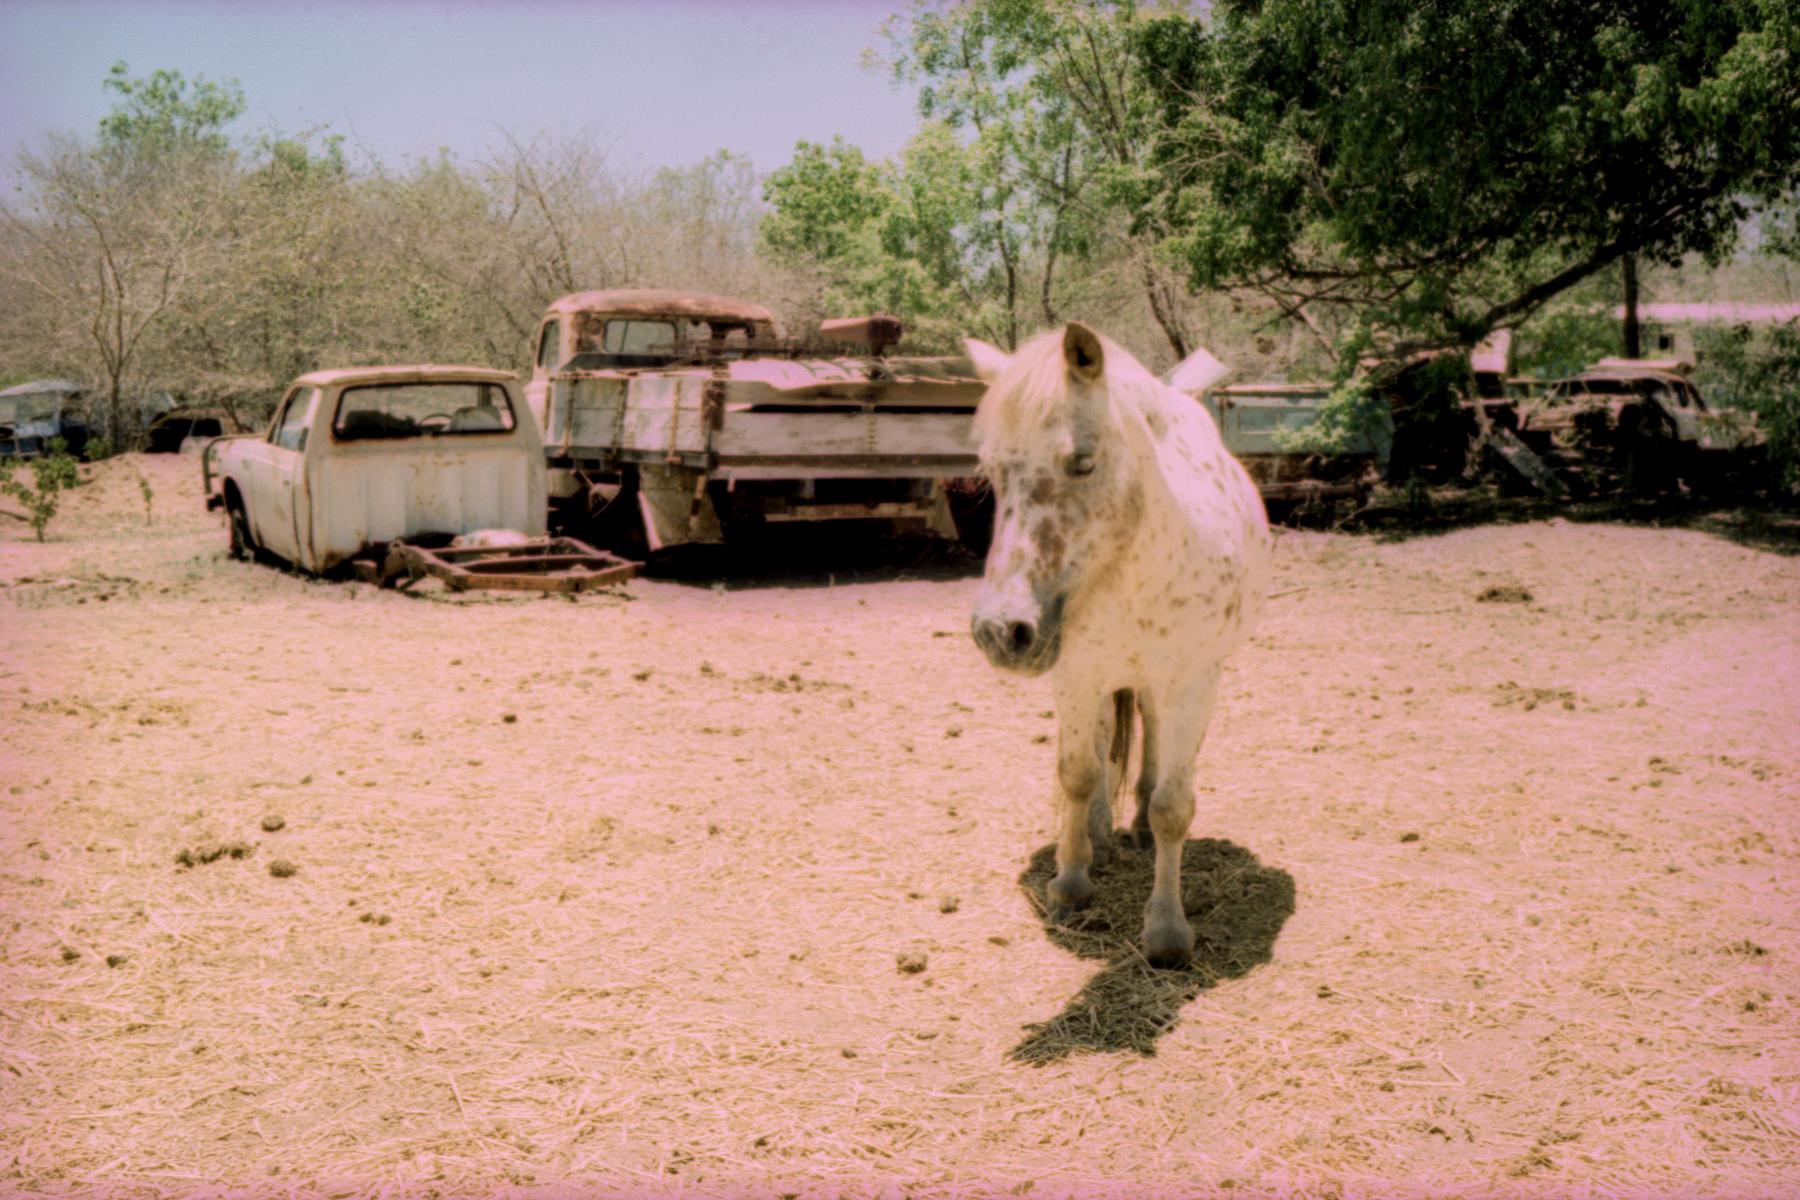 Junkyard Pony | Leica M3 | E100 in C41 | Greg Williamson